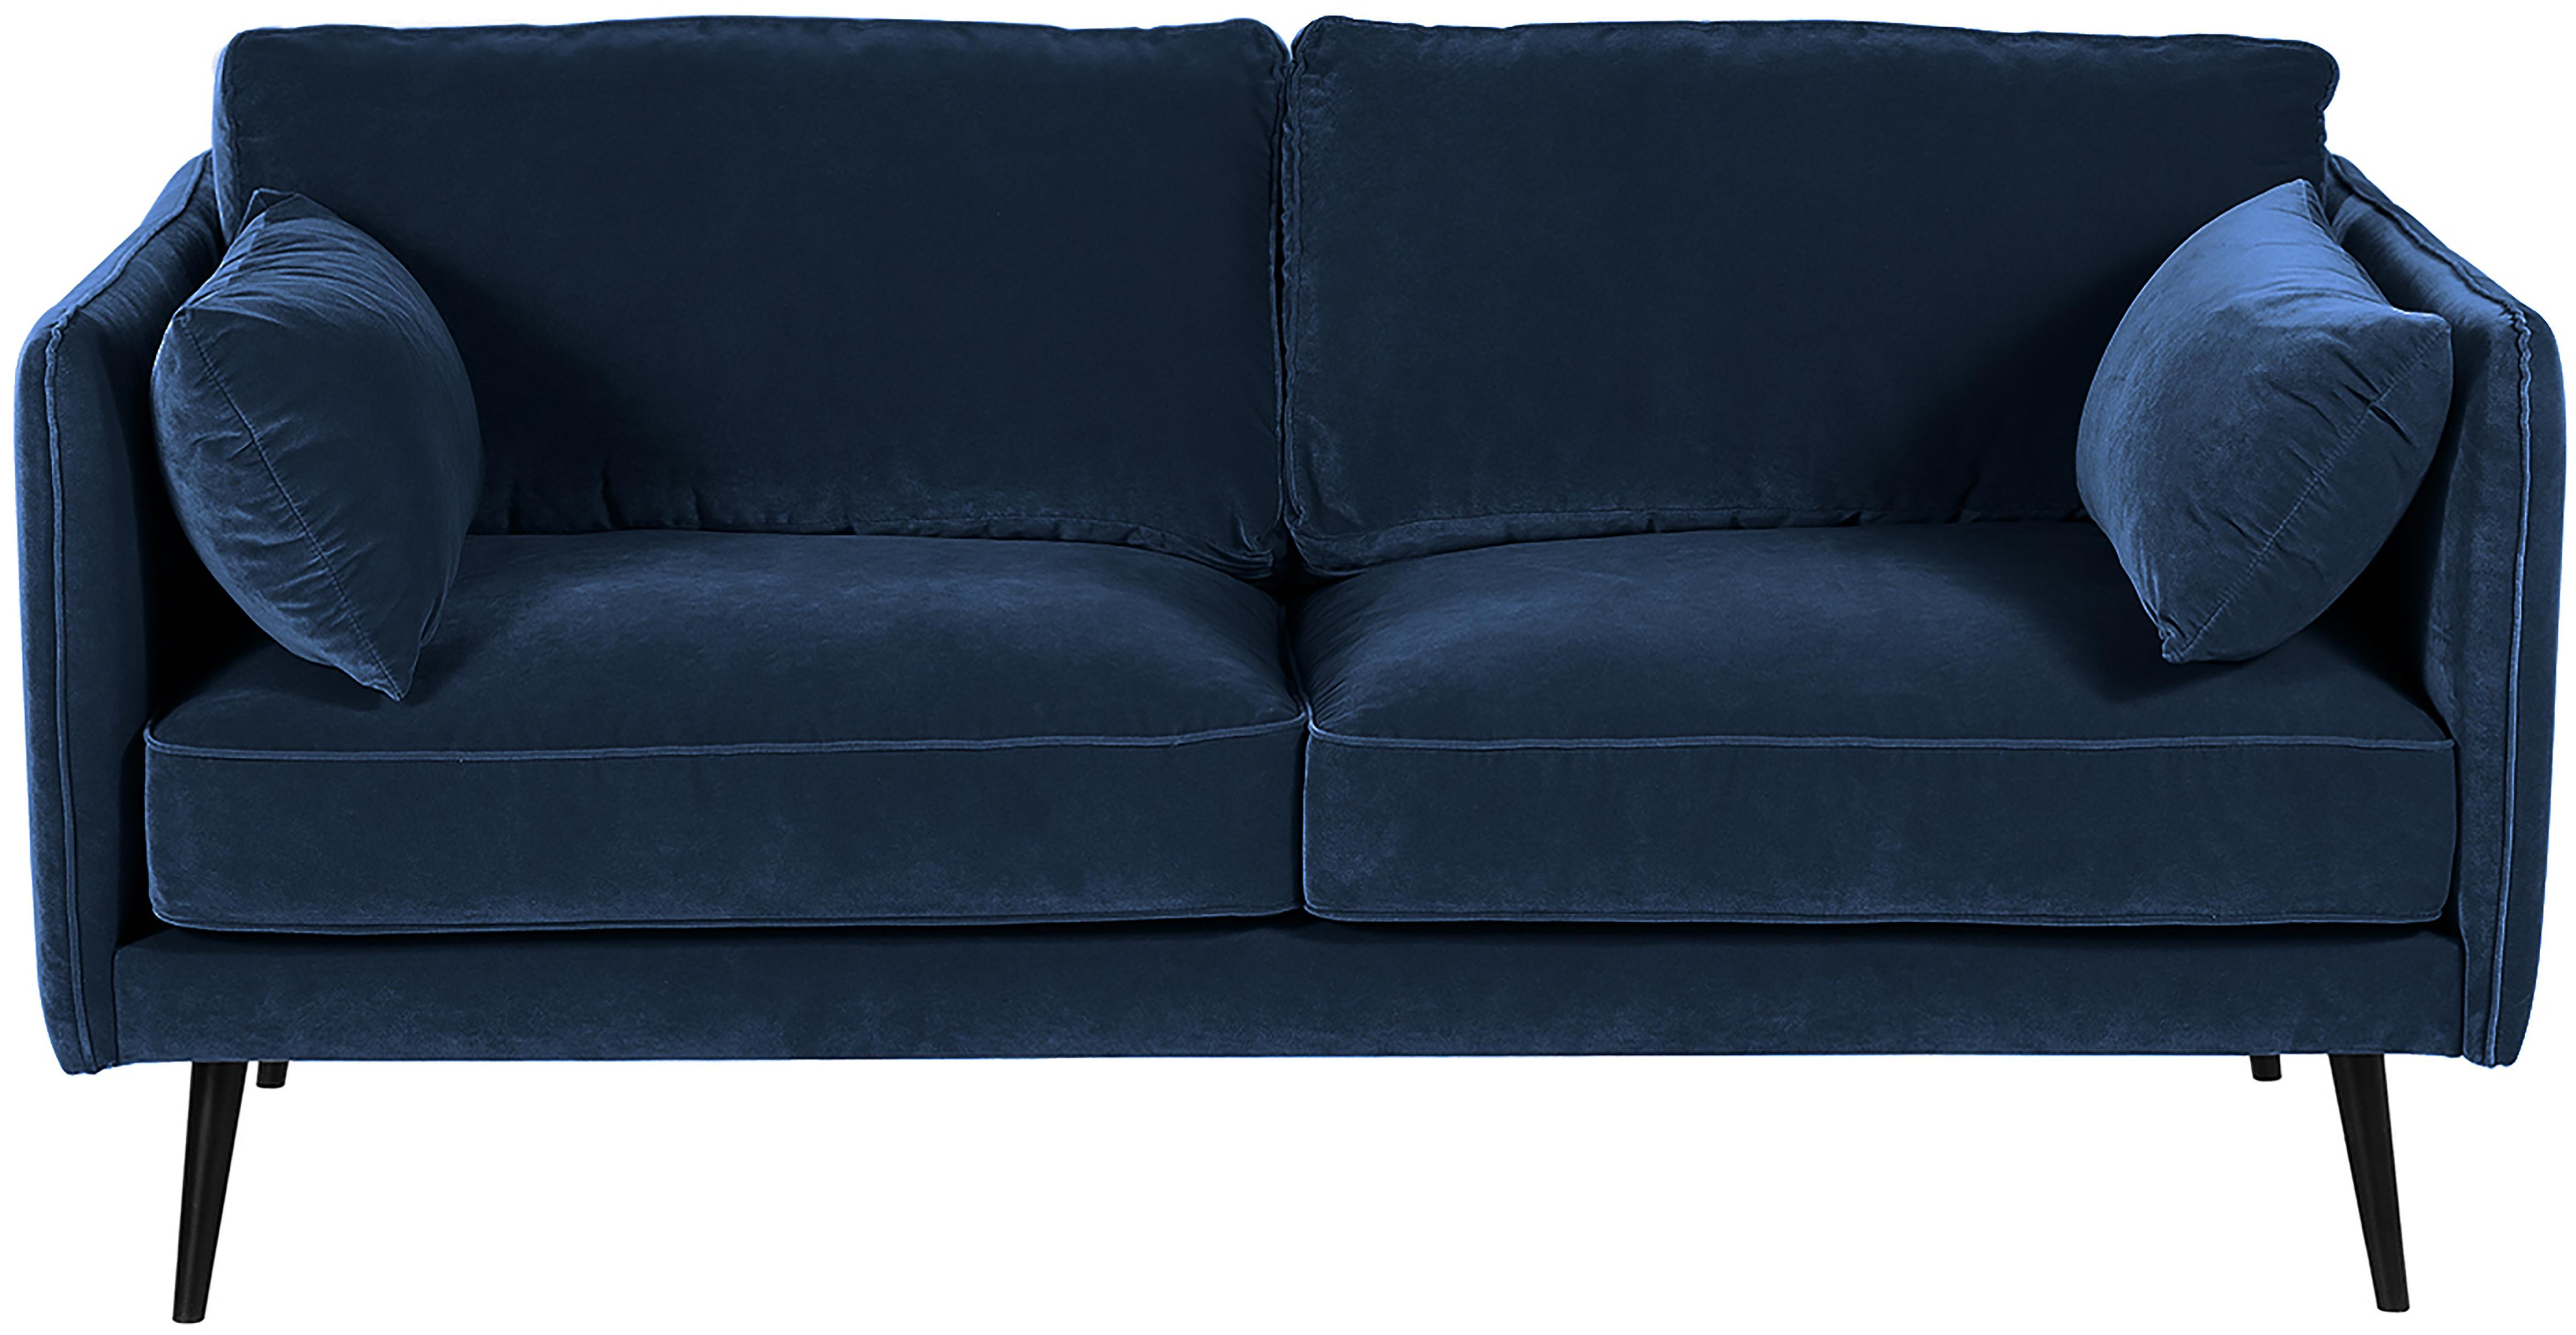 Fluwelen bank Paola (2-zits), Bekleding: fluweel (polyester), Frame: massief grenenhout, spaan, Poten: gelakt grenenhout Het FSC, Blauw, B 179 x D 95 cm